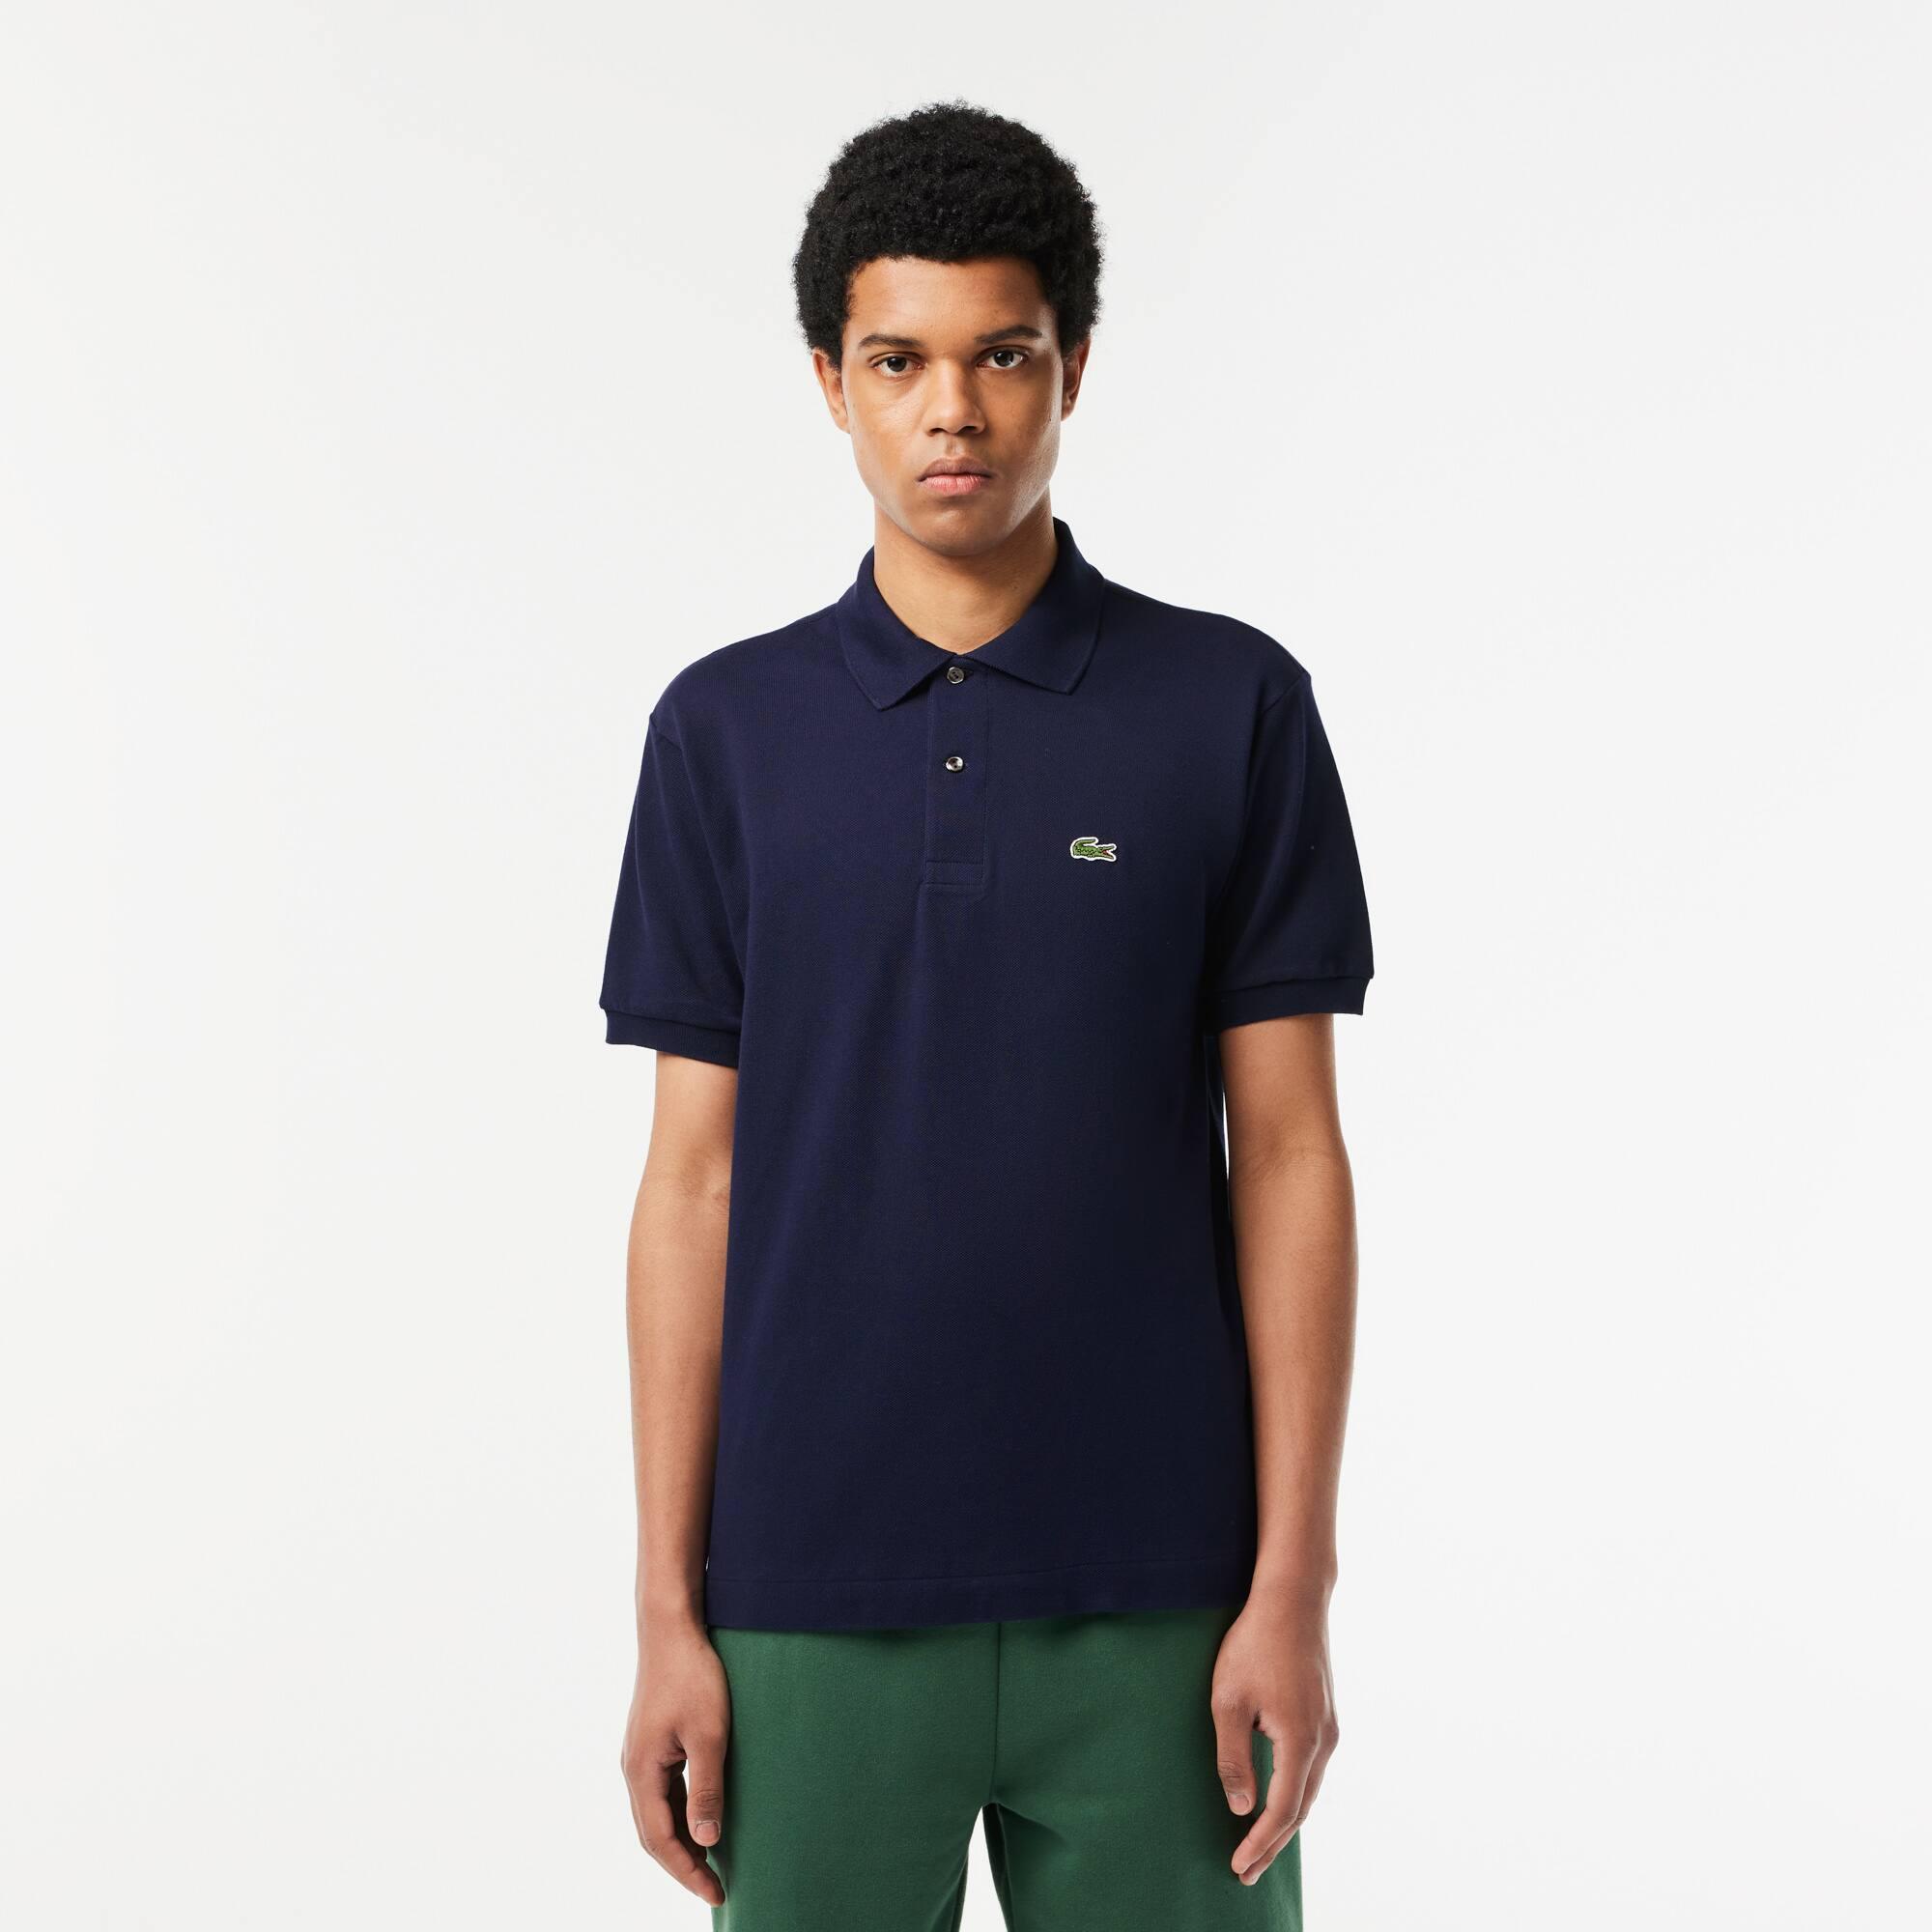 Camisas polo para homens, manga longa e manga curta   LACOSTE 01be313dfe